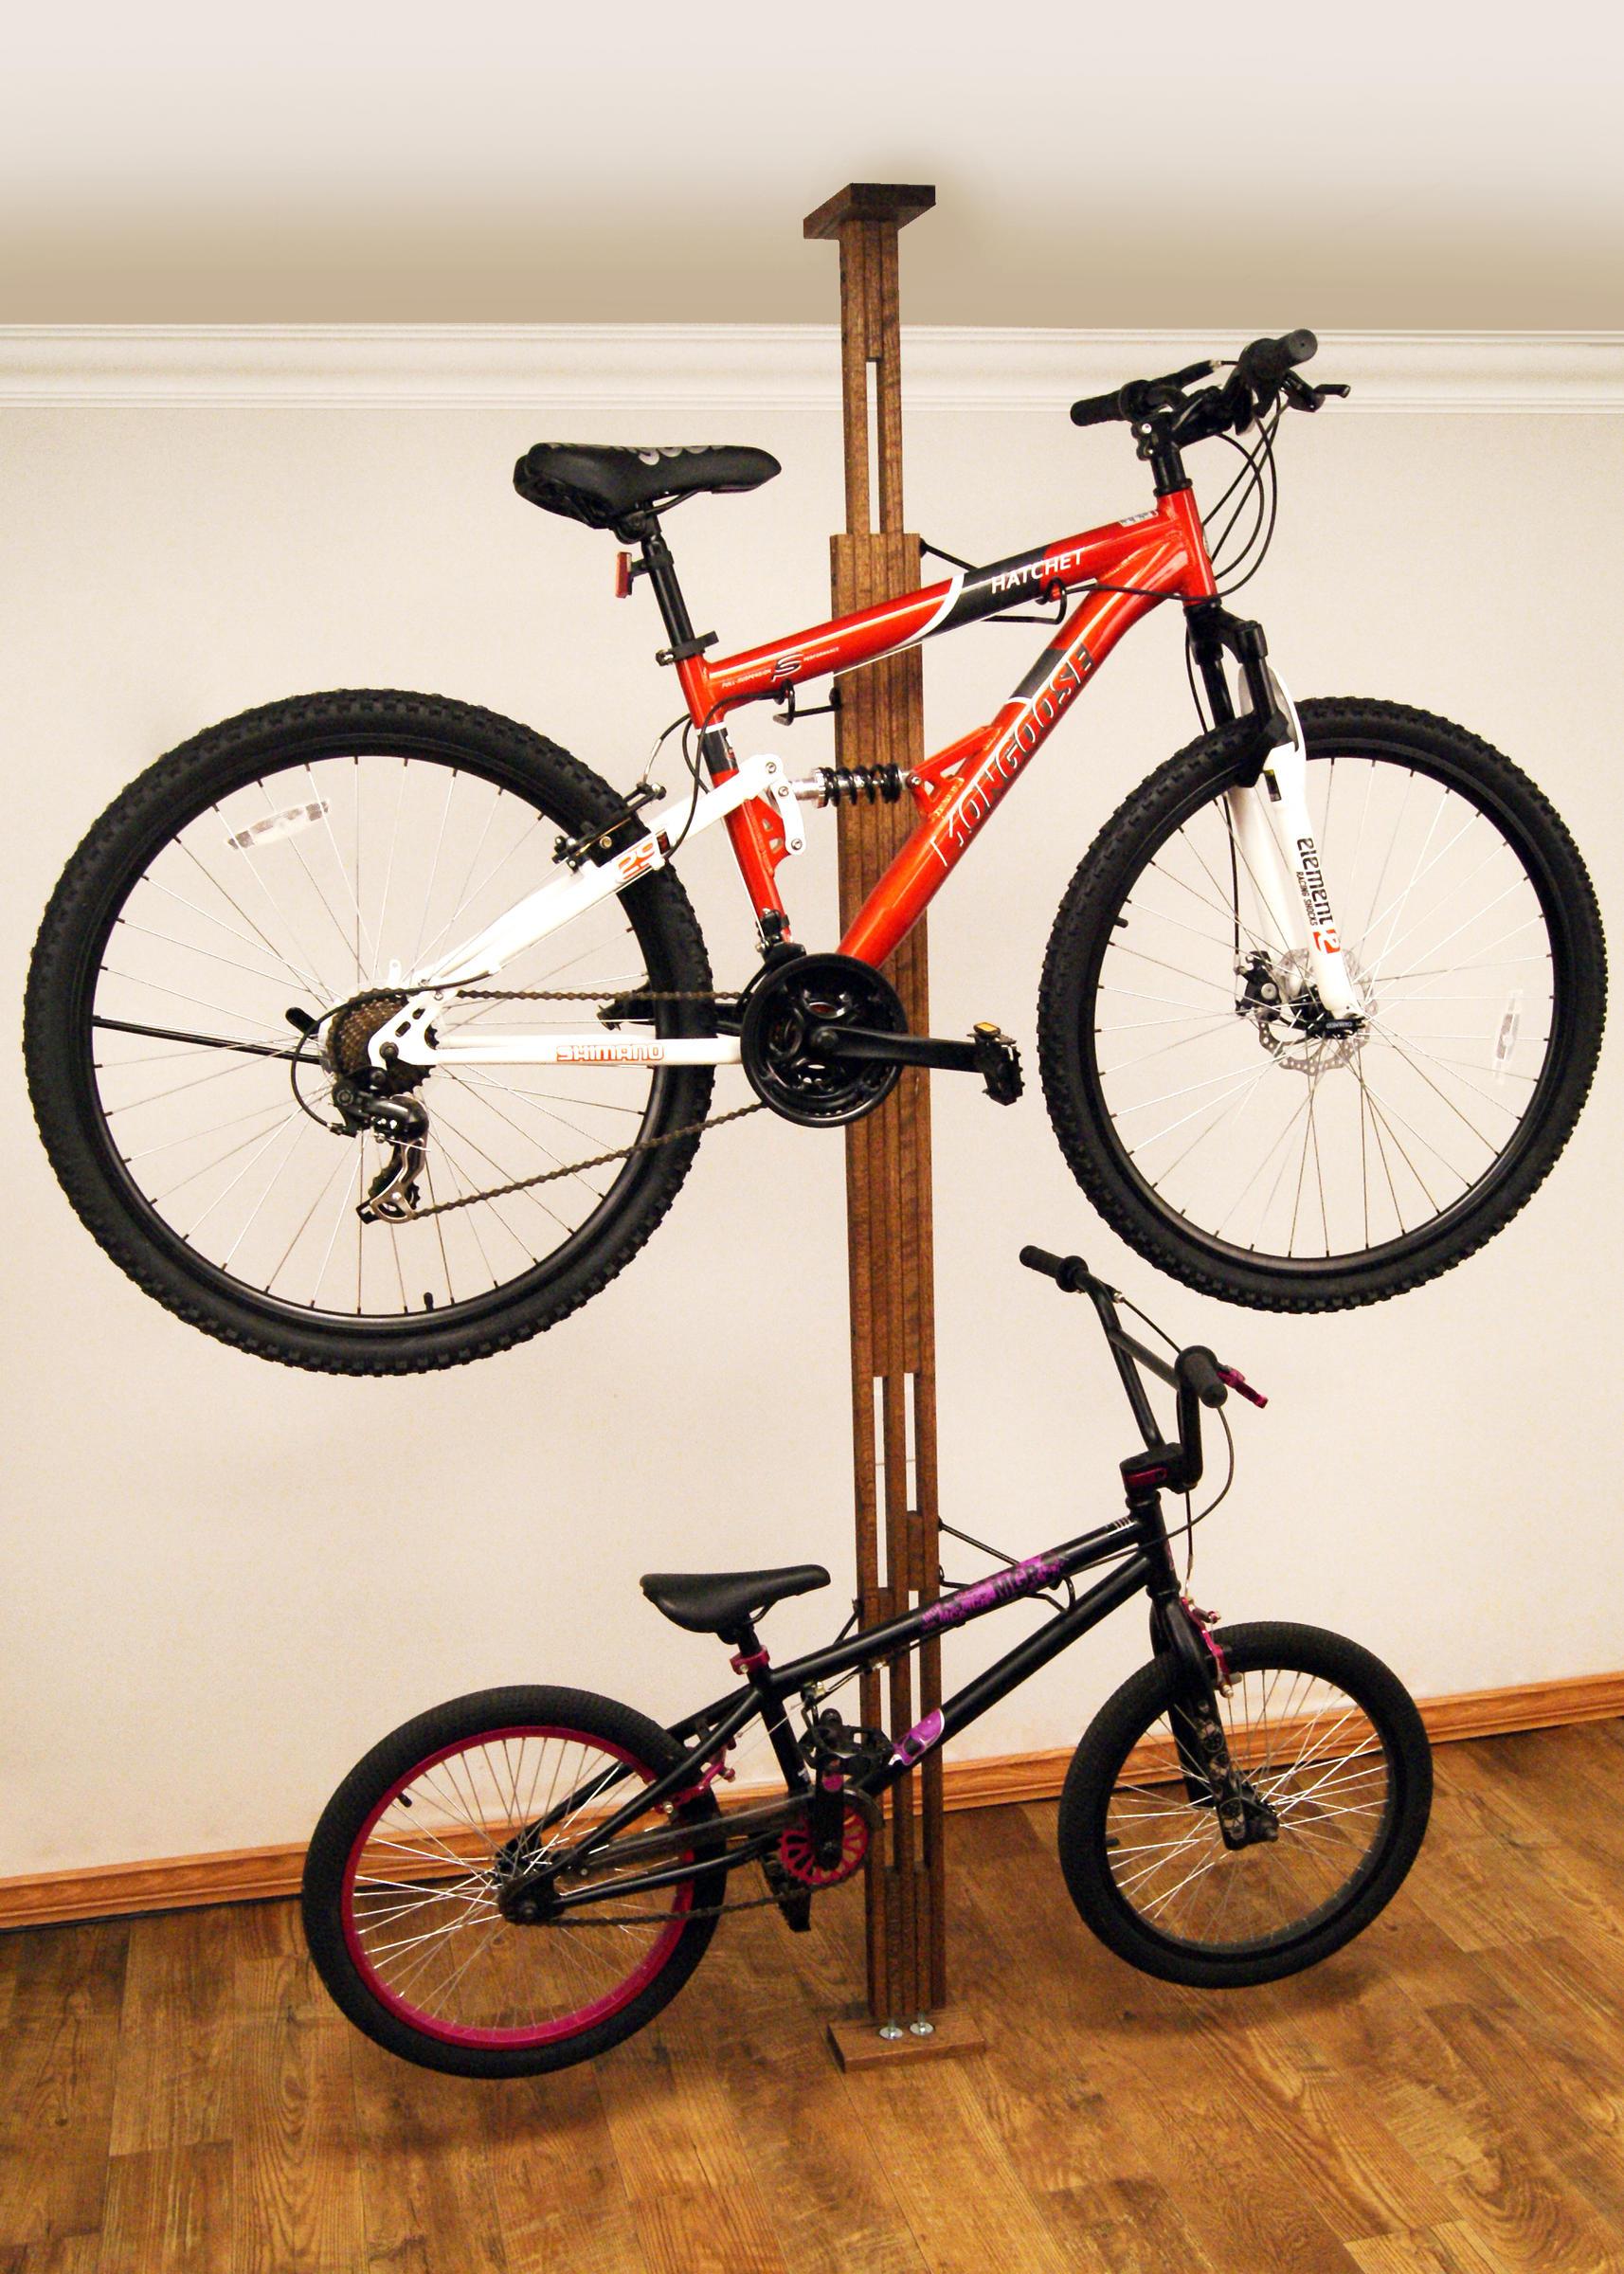 Ceiling 2 Bike Storage Rack